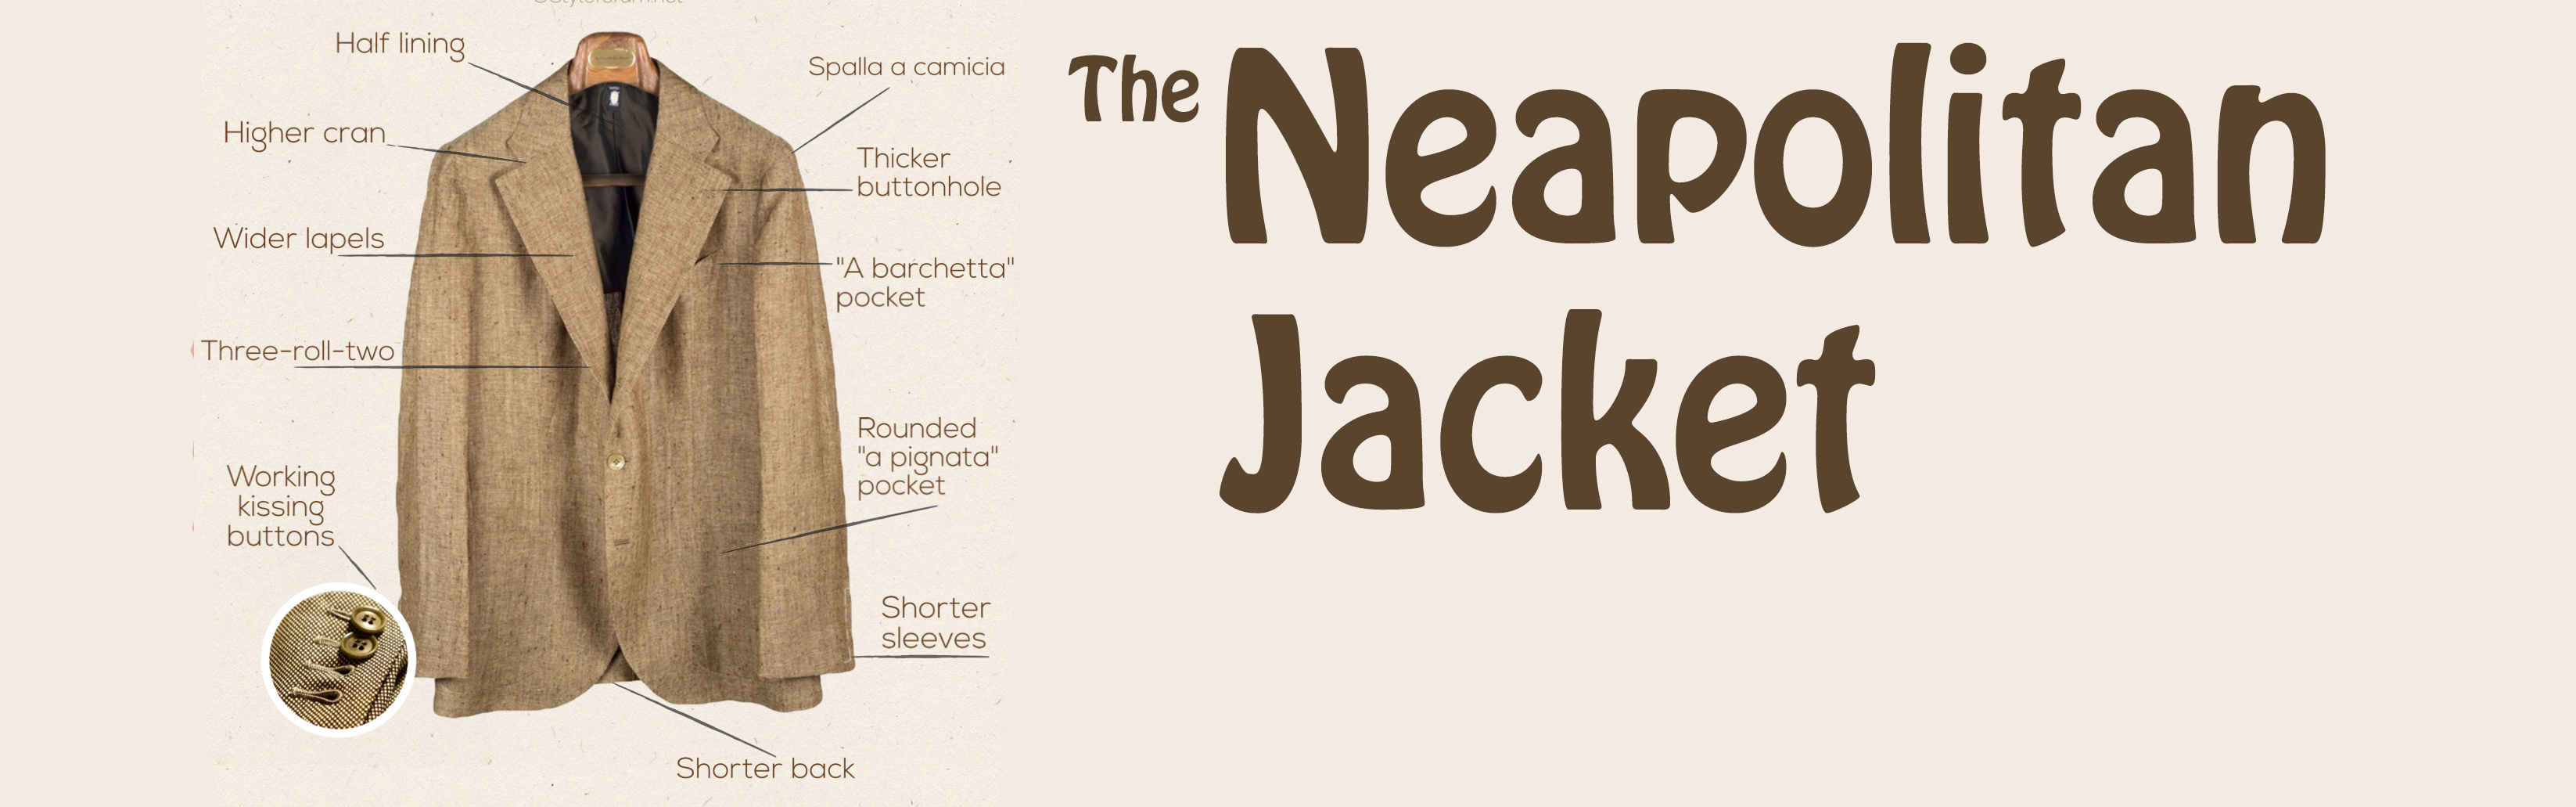 neapolitan jacket construction characteristics lapels roll buttonholes copy.jpg